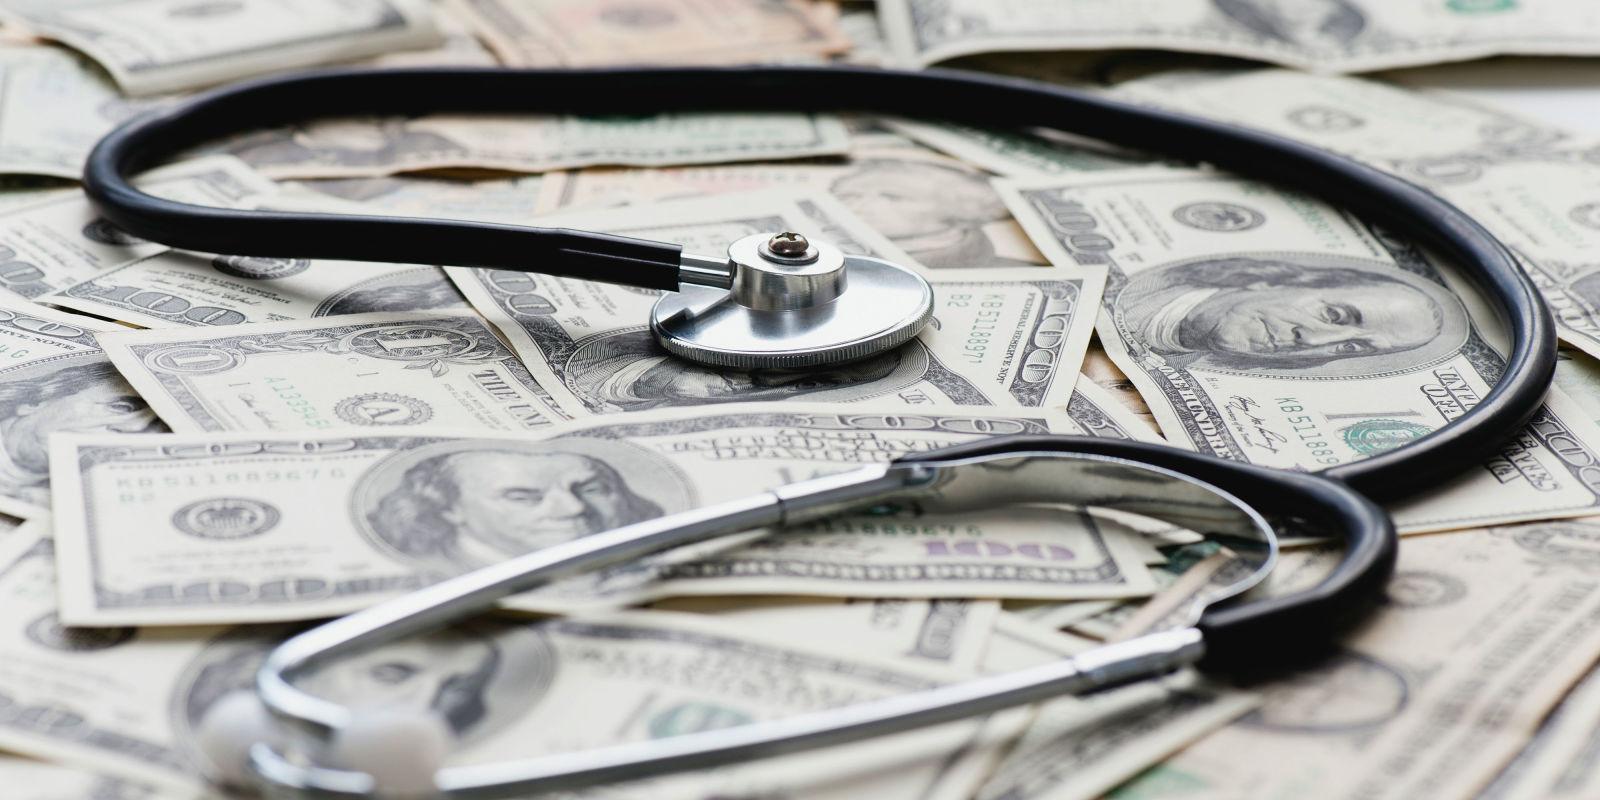 medical expense insurance photo - 1